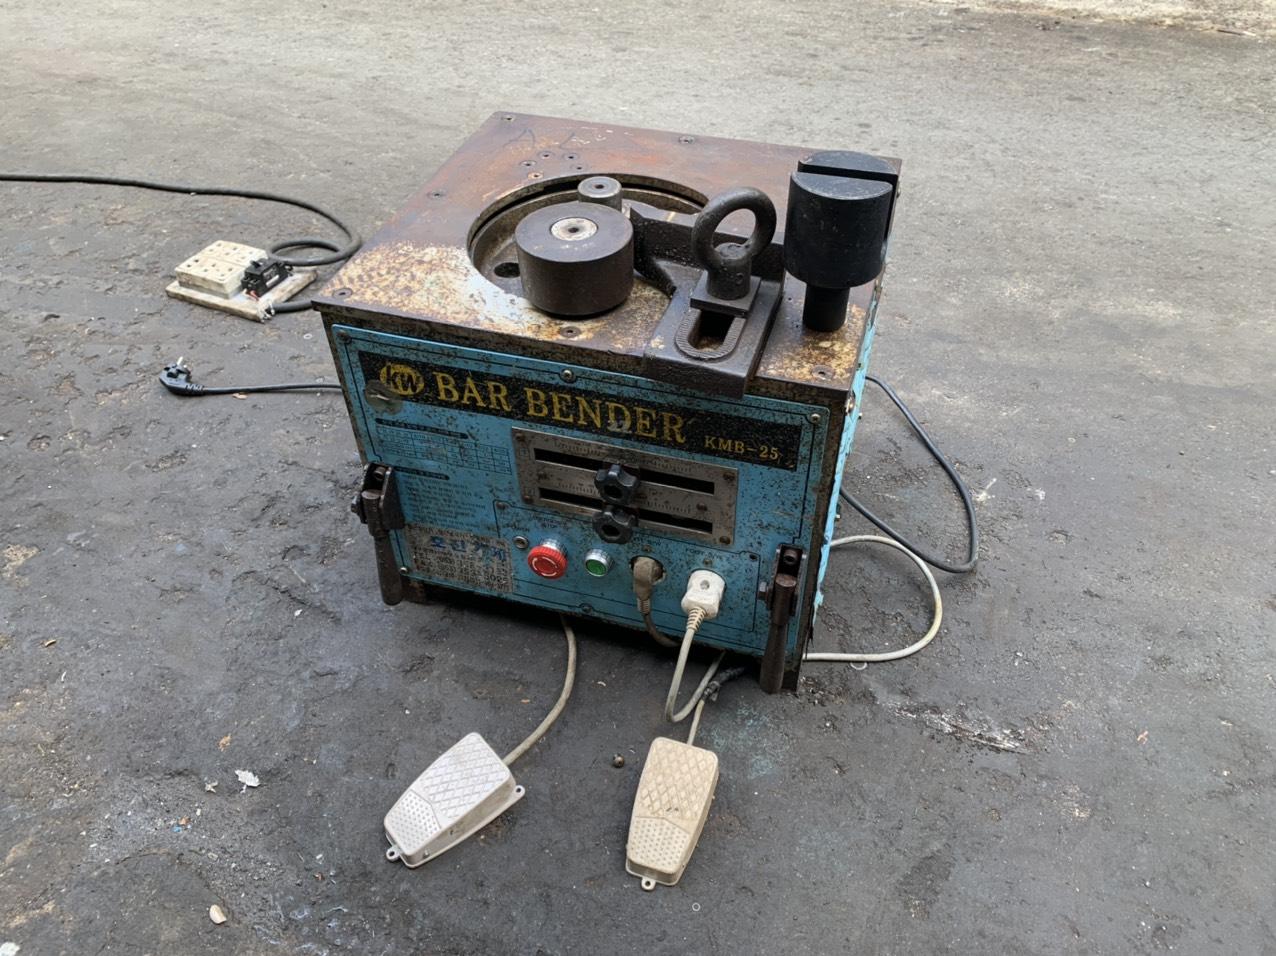 cho thuê máy uốn sắt 25 kunwoo kmb-25